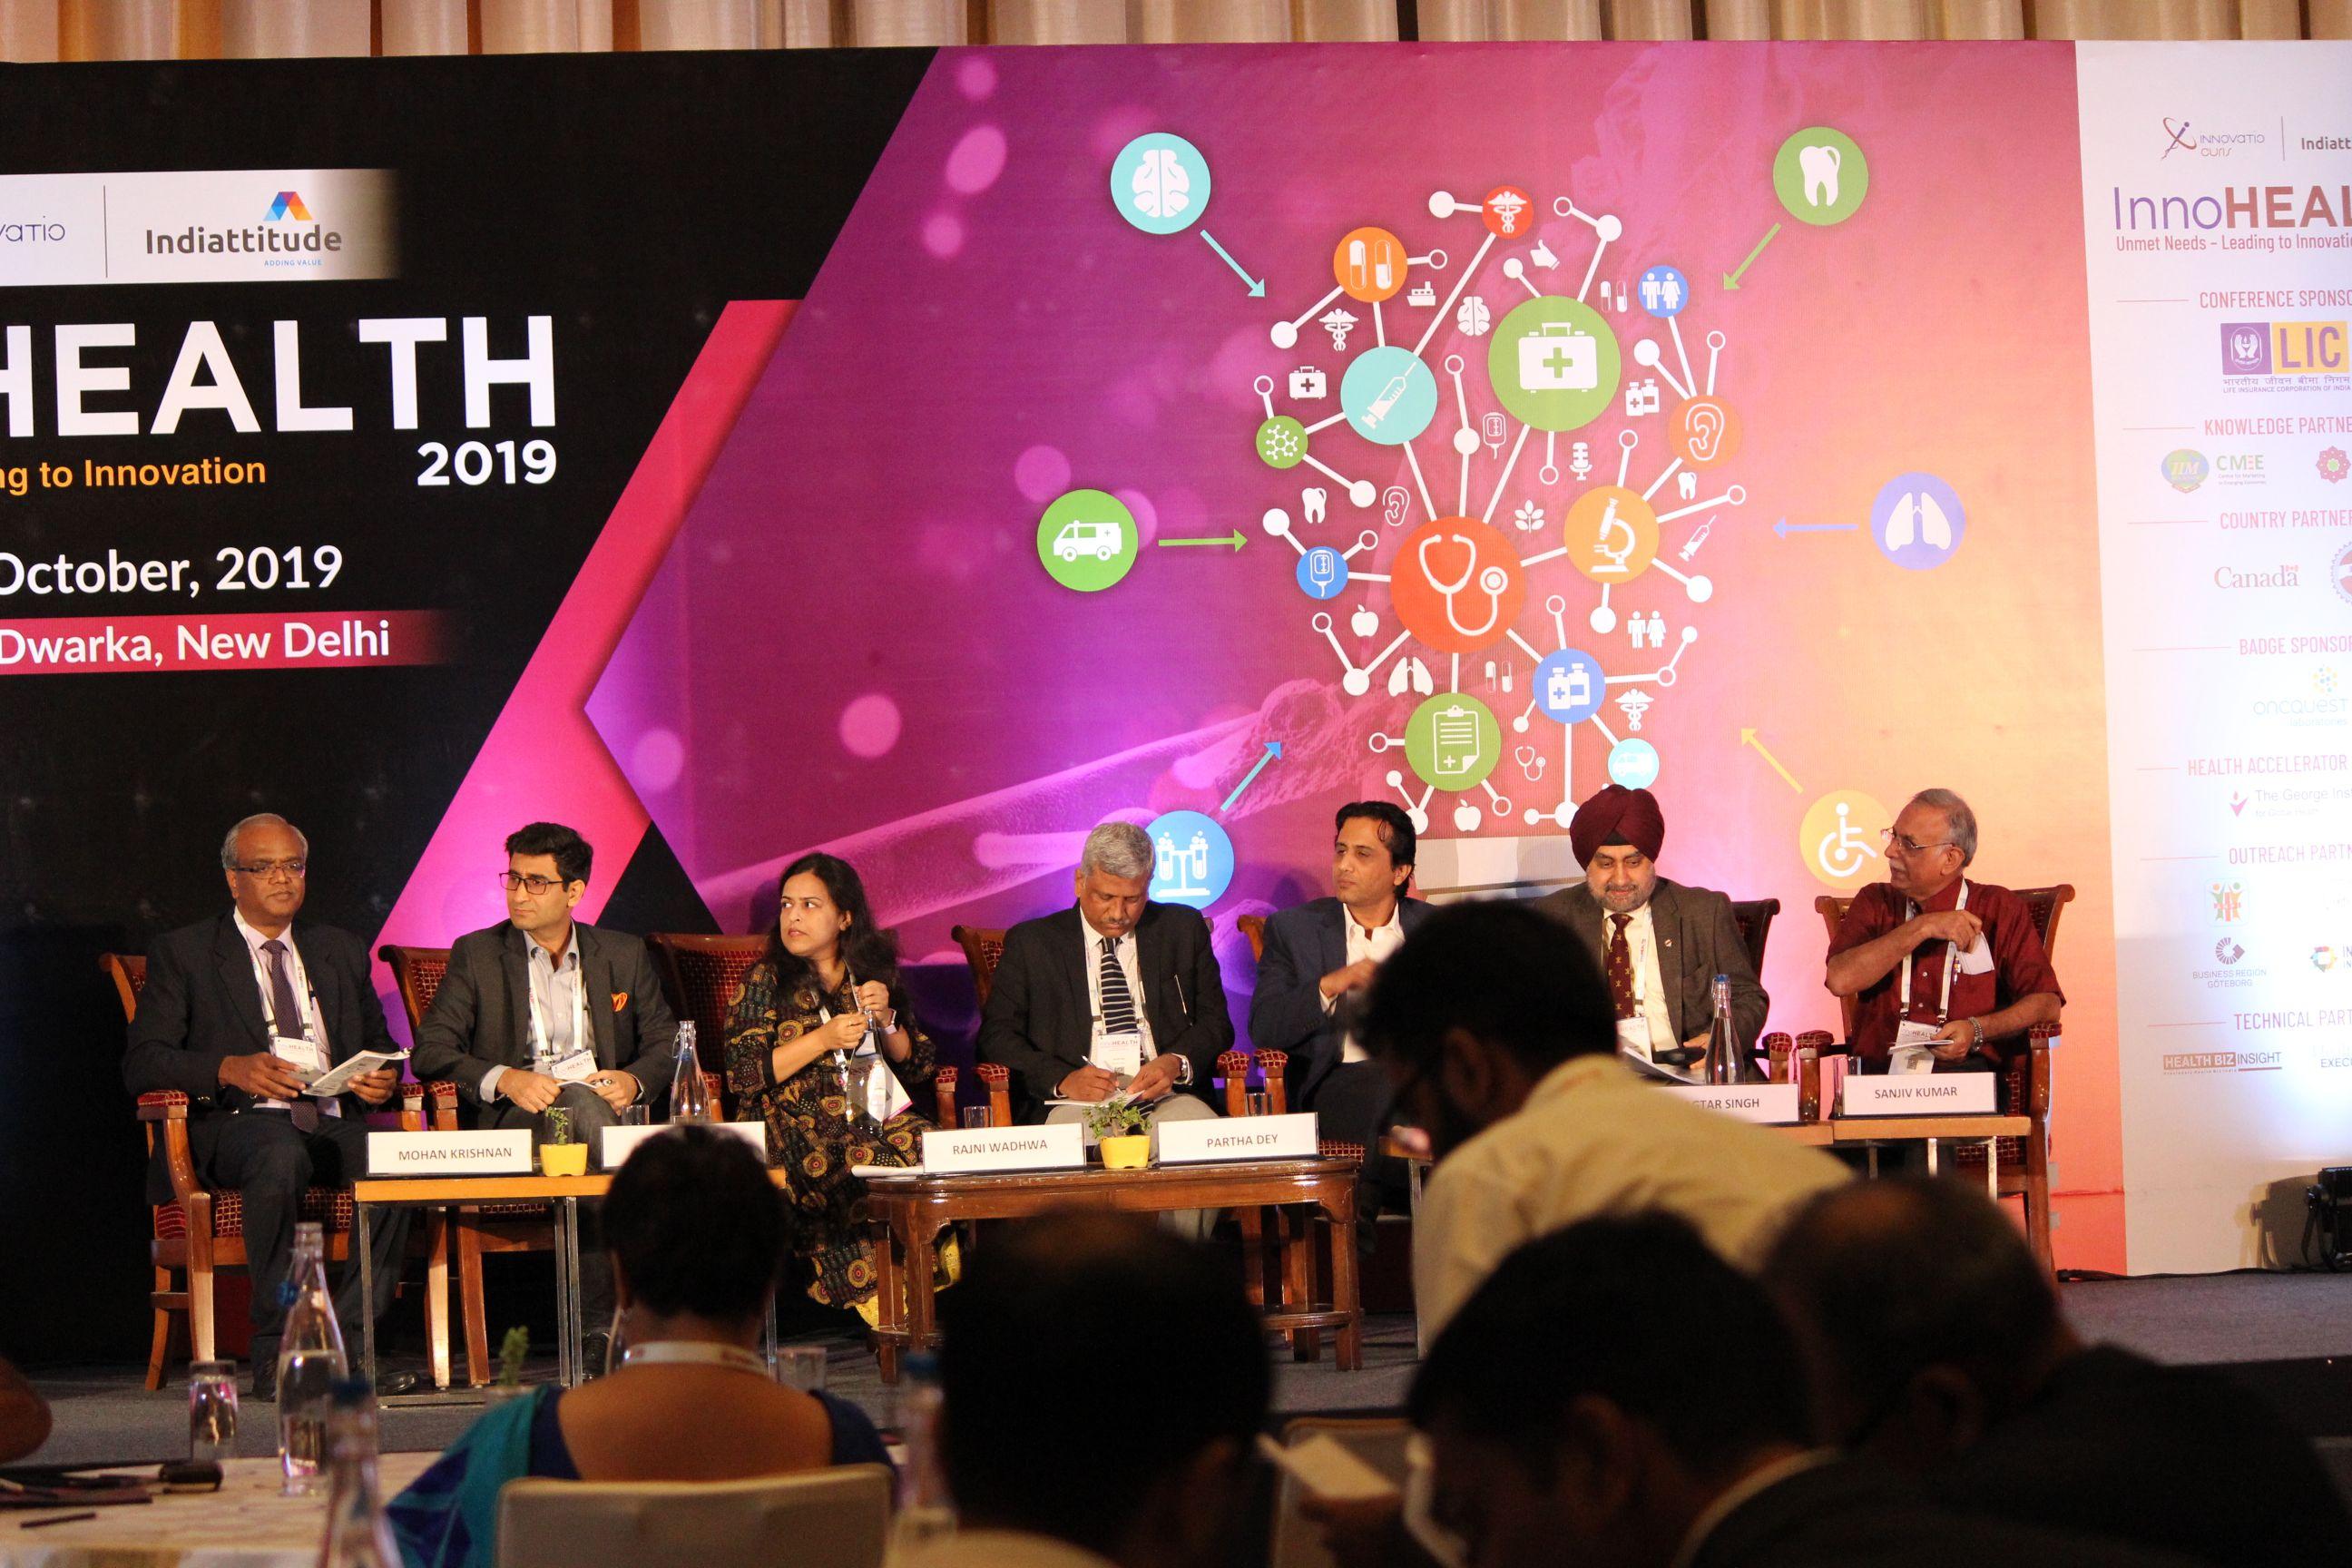 Panelists at Session 2InnoHEALTH 2019